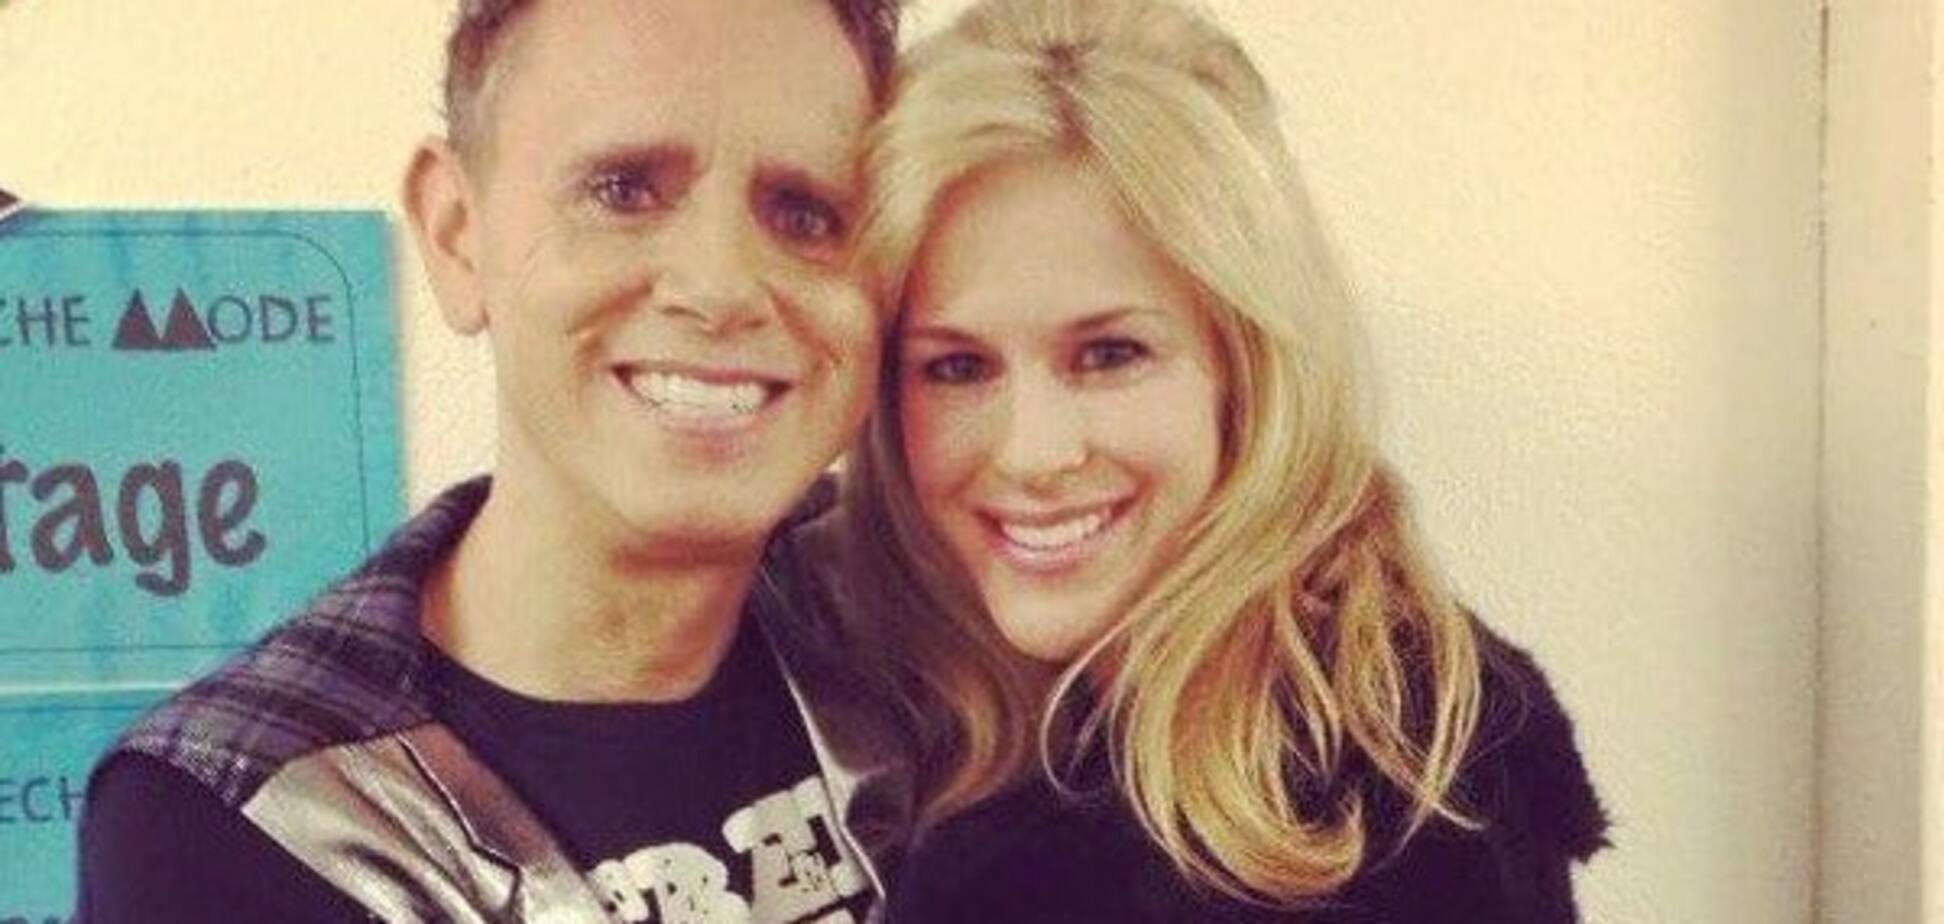 Рокер из Depeche Mode стал отцом в 54 года